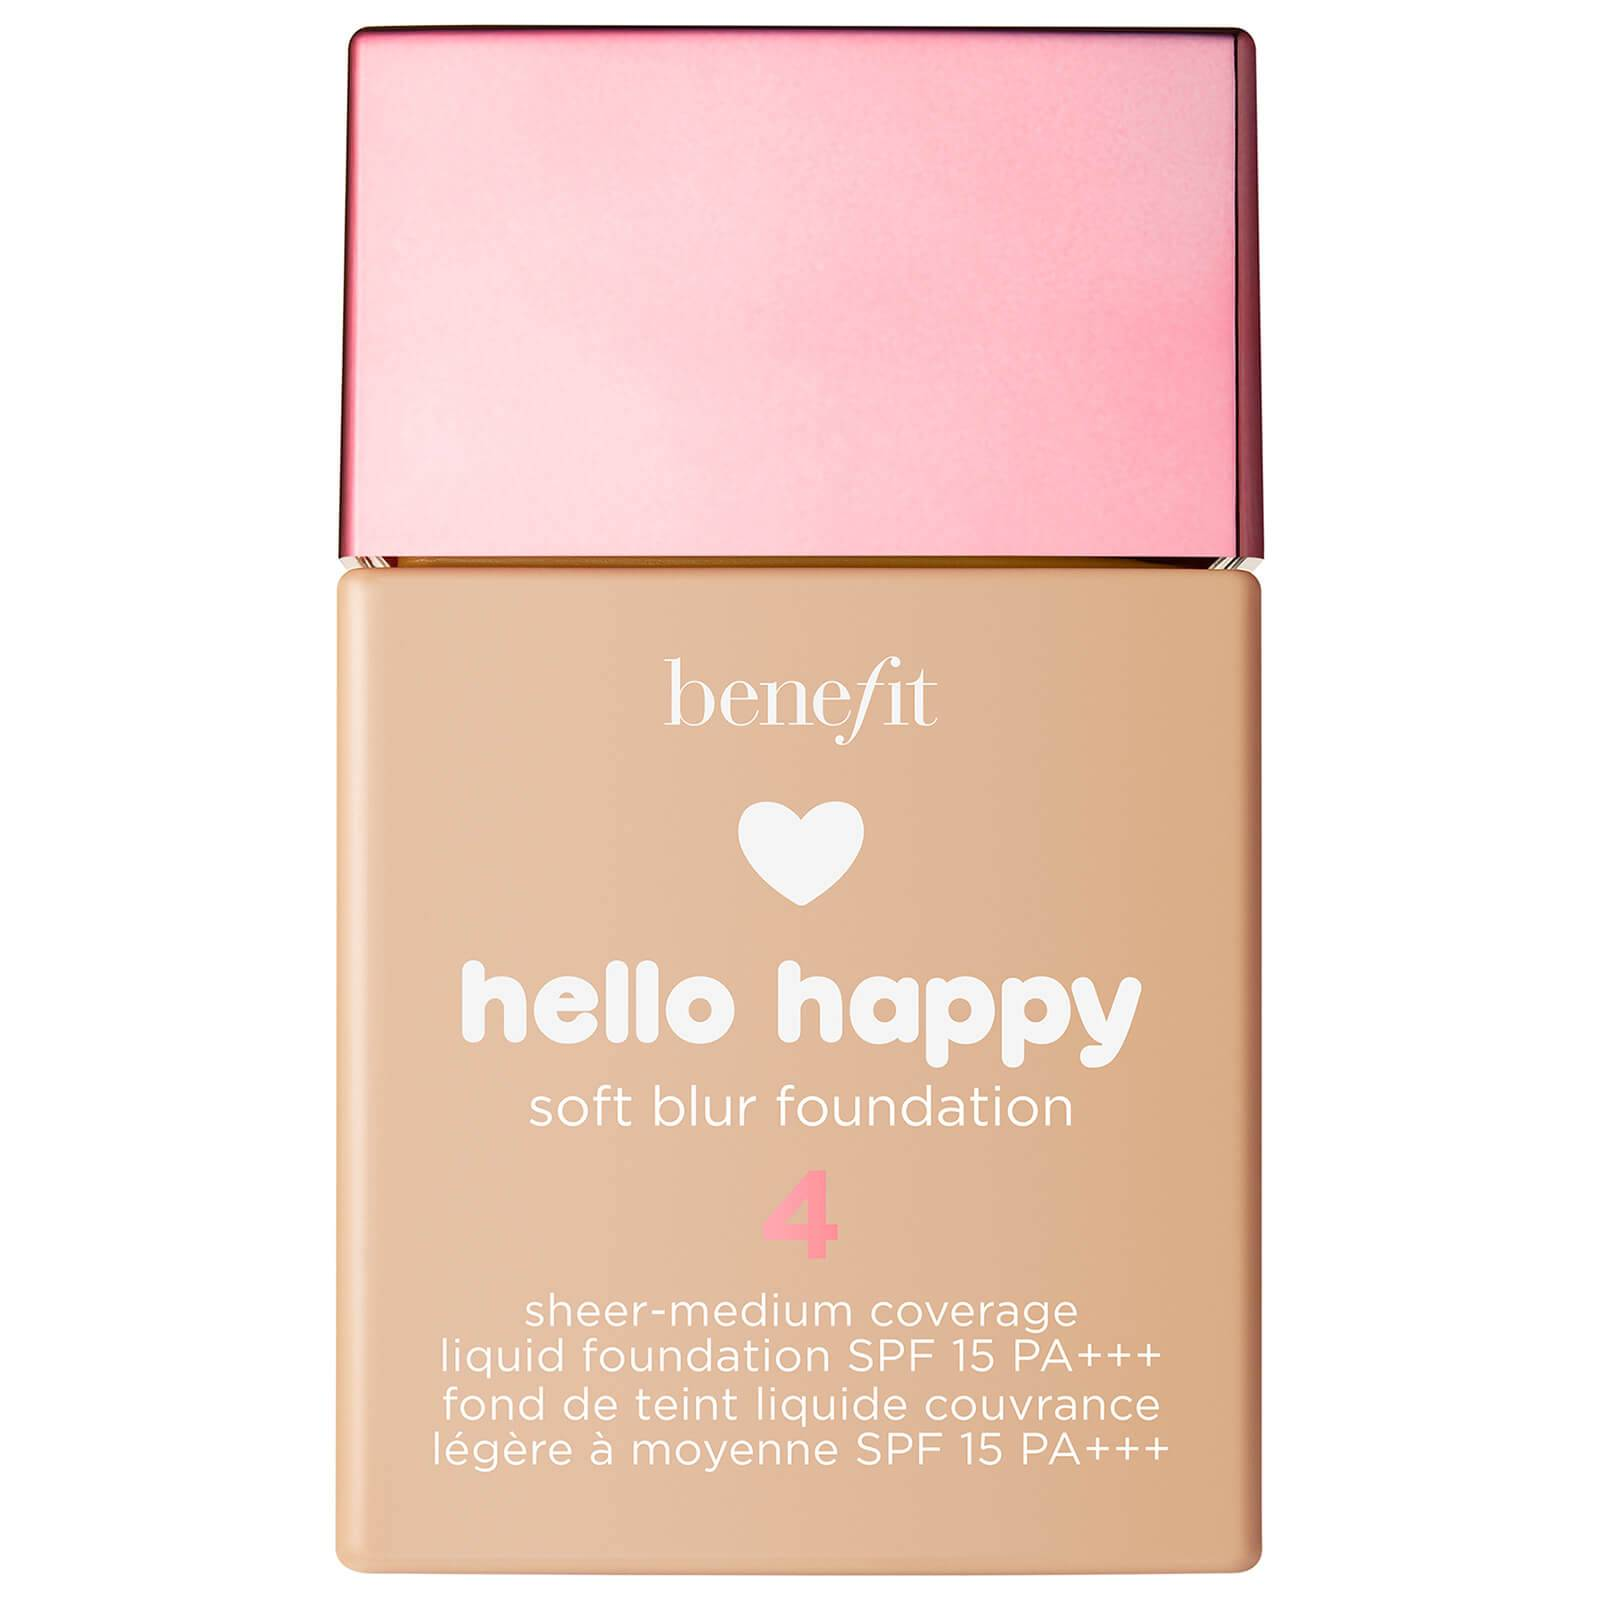 Benefit Hello Happy Soft Blur Foundation (Various Shades) - 4